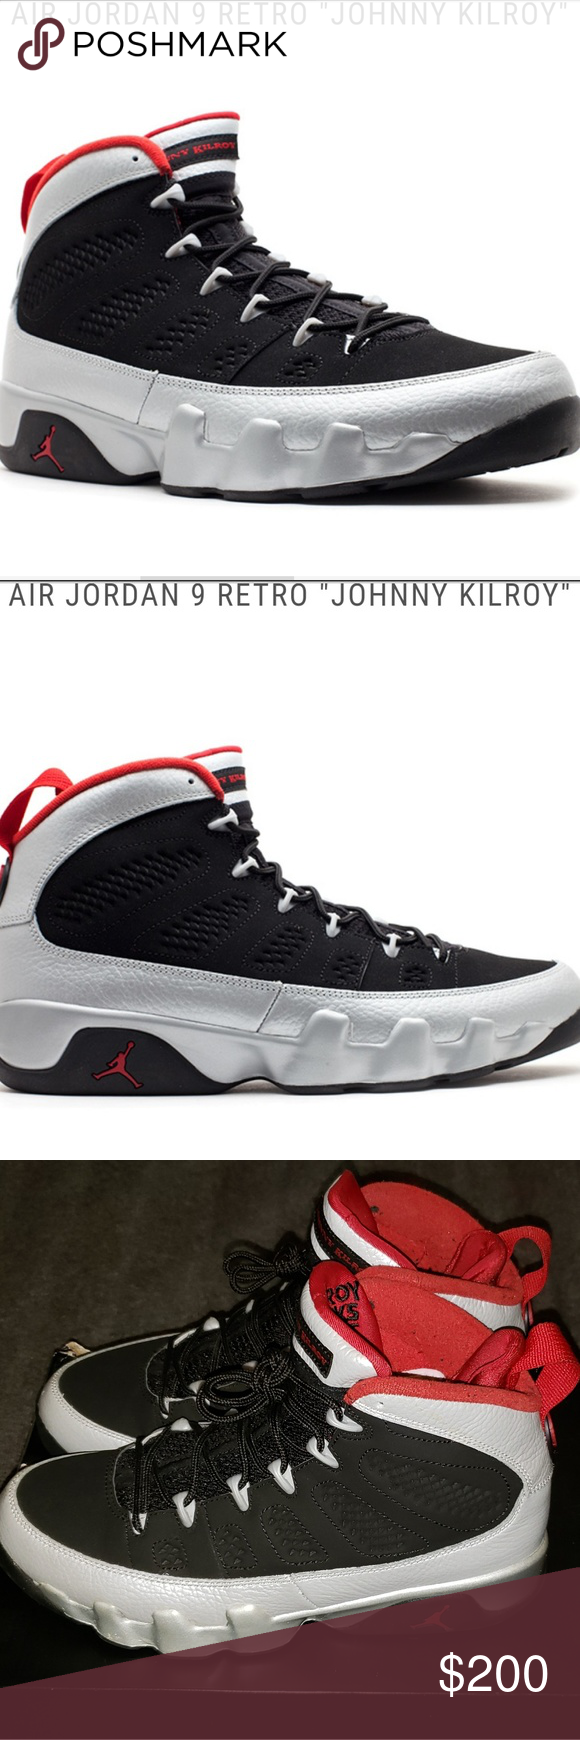 8a18f79b44e Retro Jordan 9 Rare Jordan 9 Johnny Kilroy Edition Jordan Shoes Sneakers